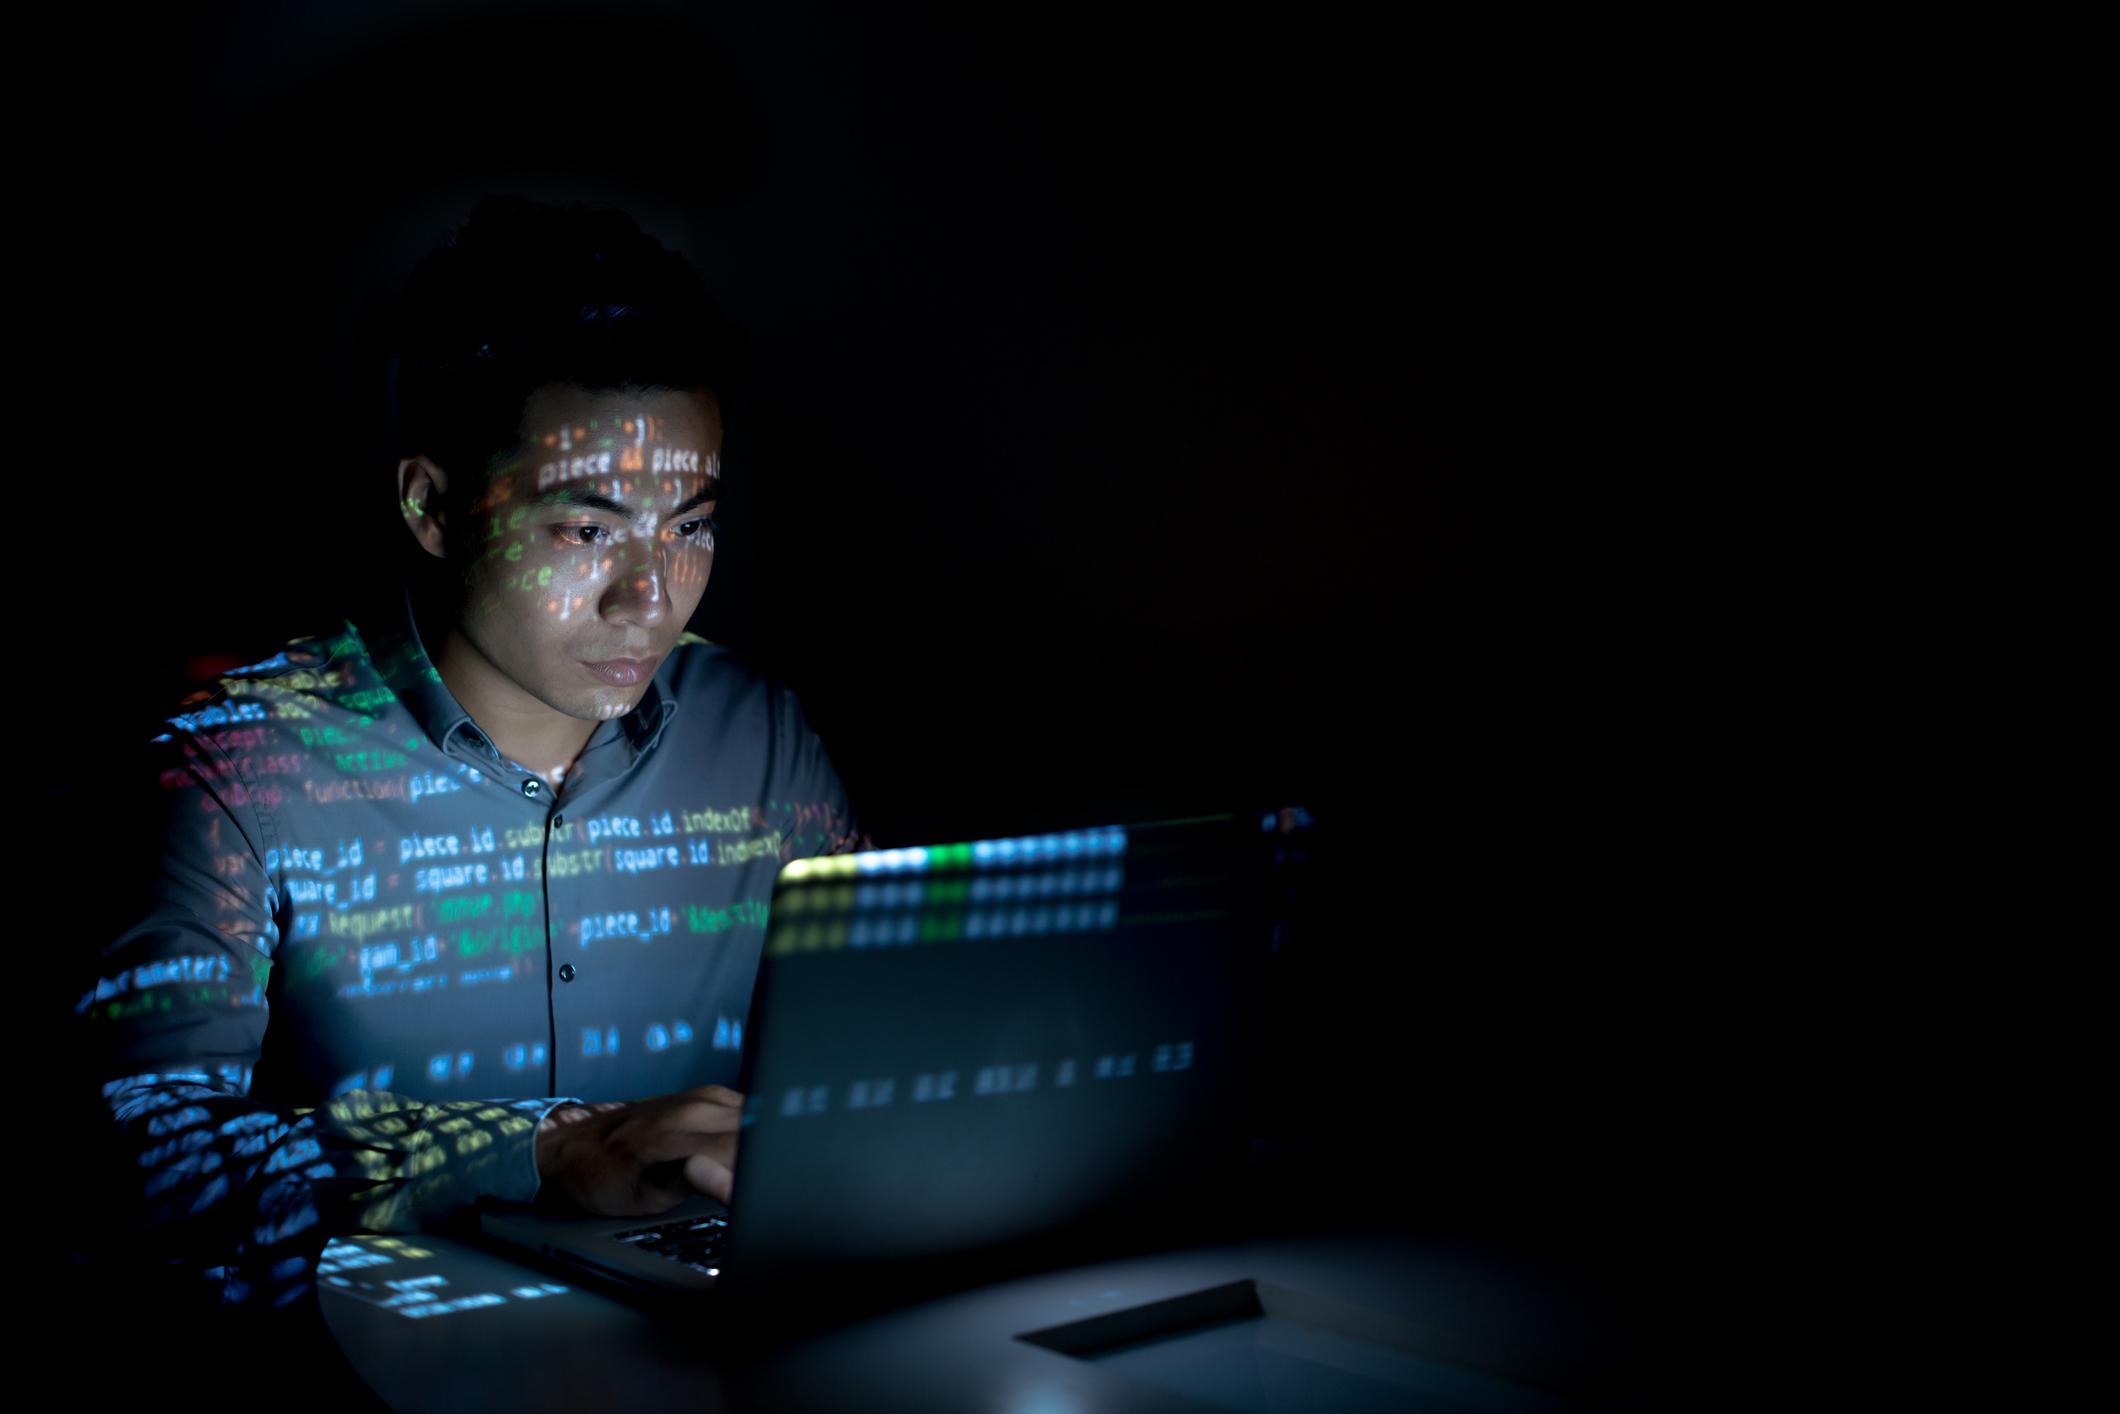 How to interpret software code?